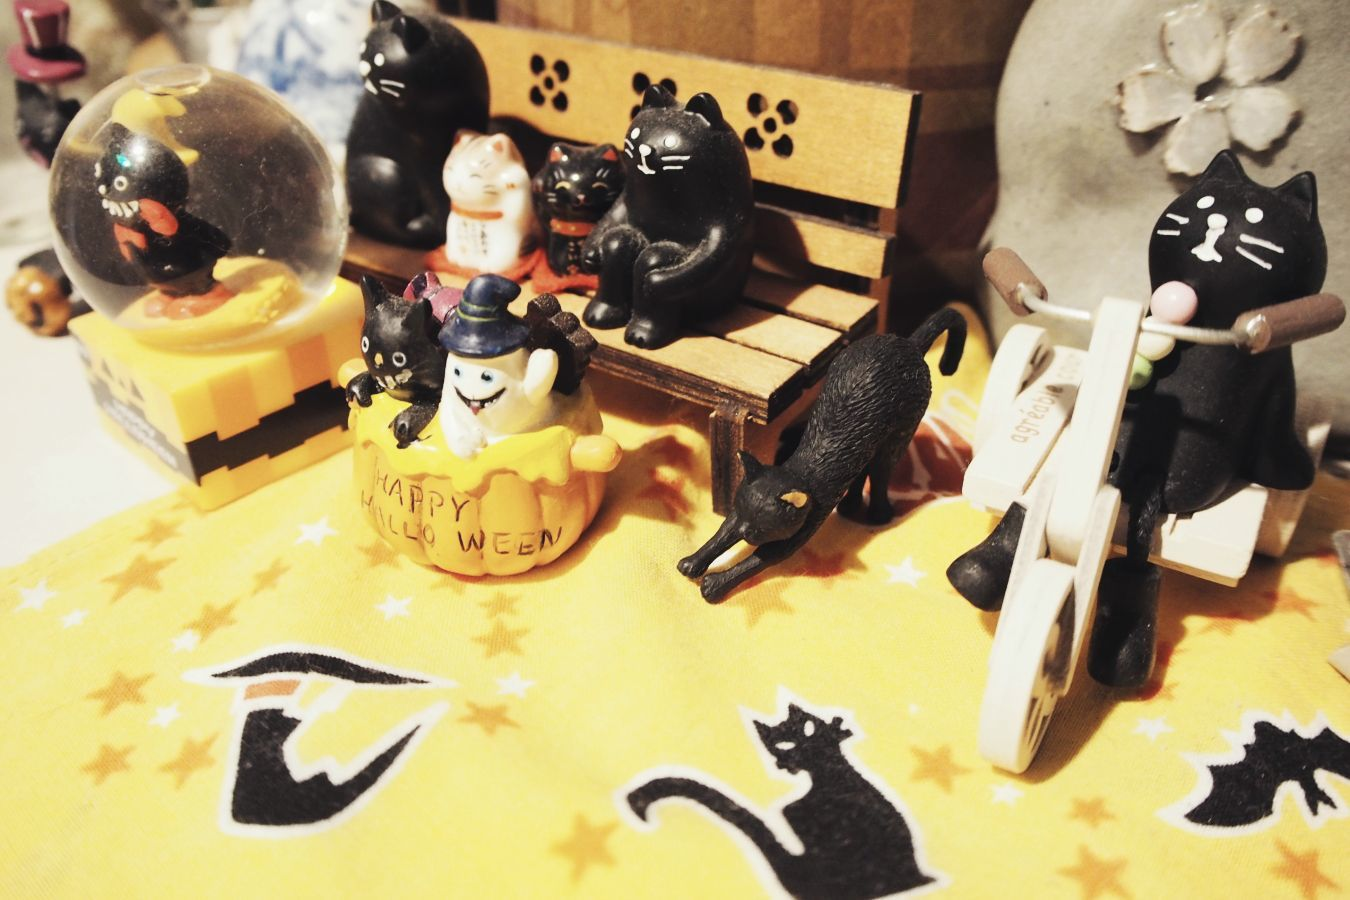 【Photo】ハロウィンは、黒猫_b0008655_19404588.jpg